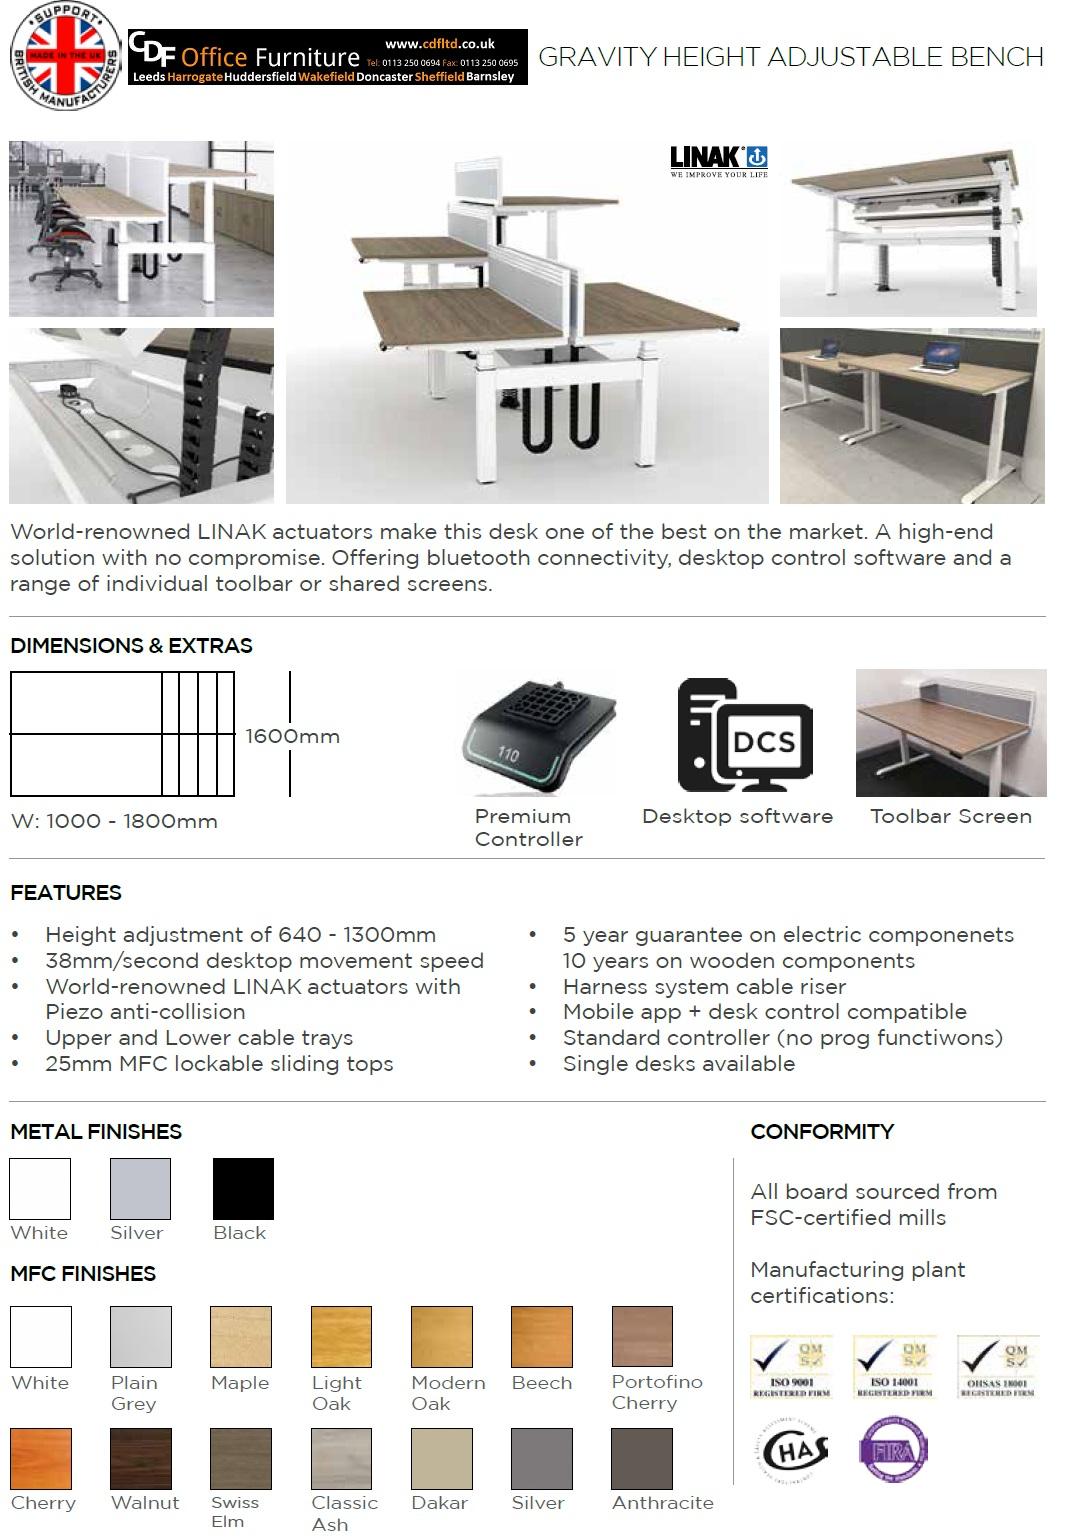 Spec Sheets Leeds Office Furniture